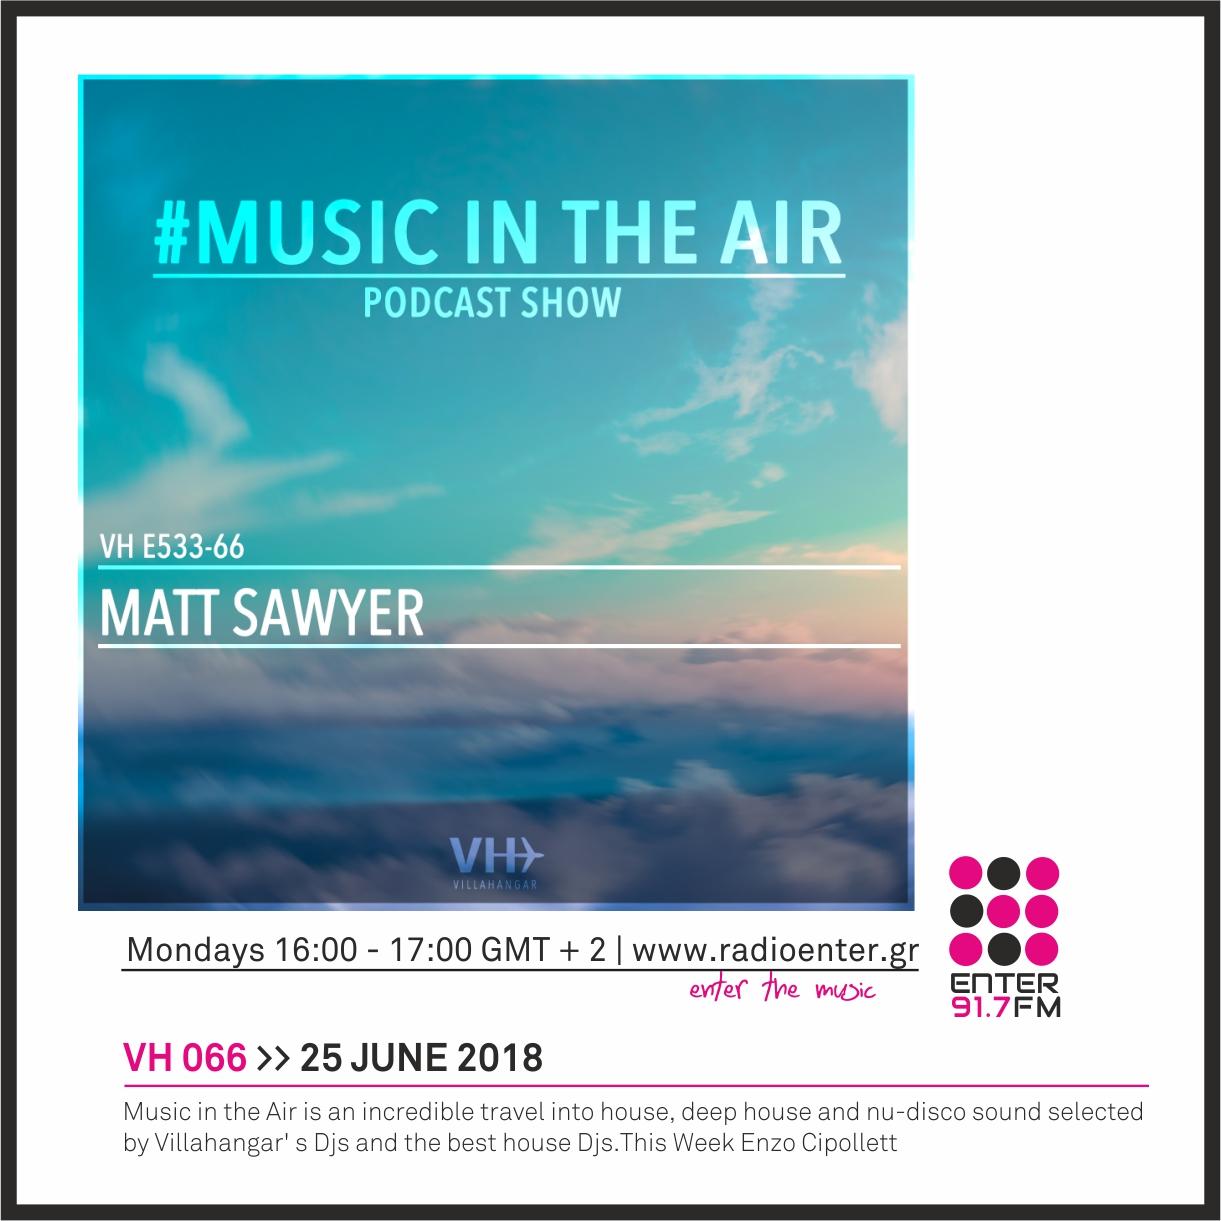 2018.06.25 - Villahangar captain presents Music In the Air 066